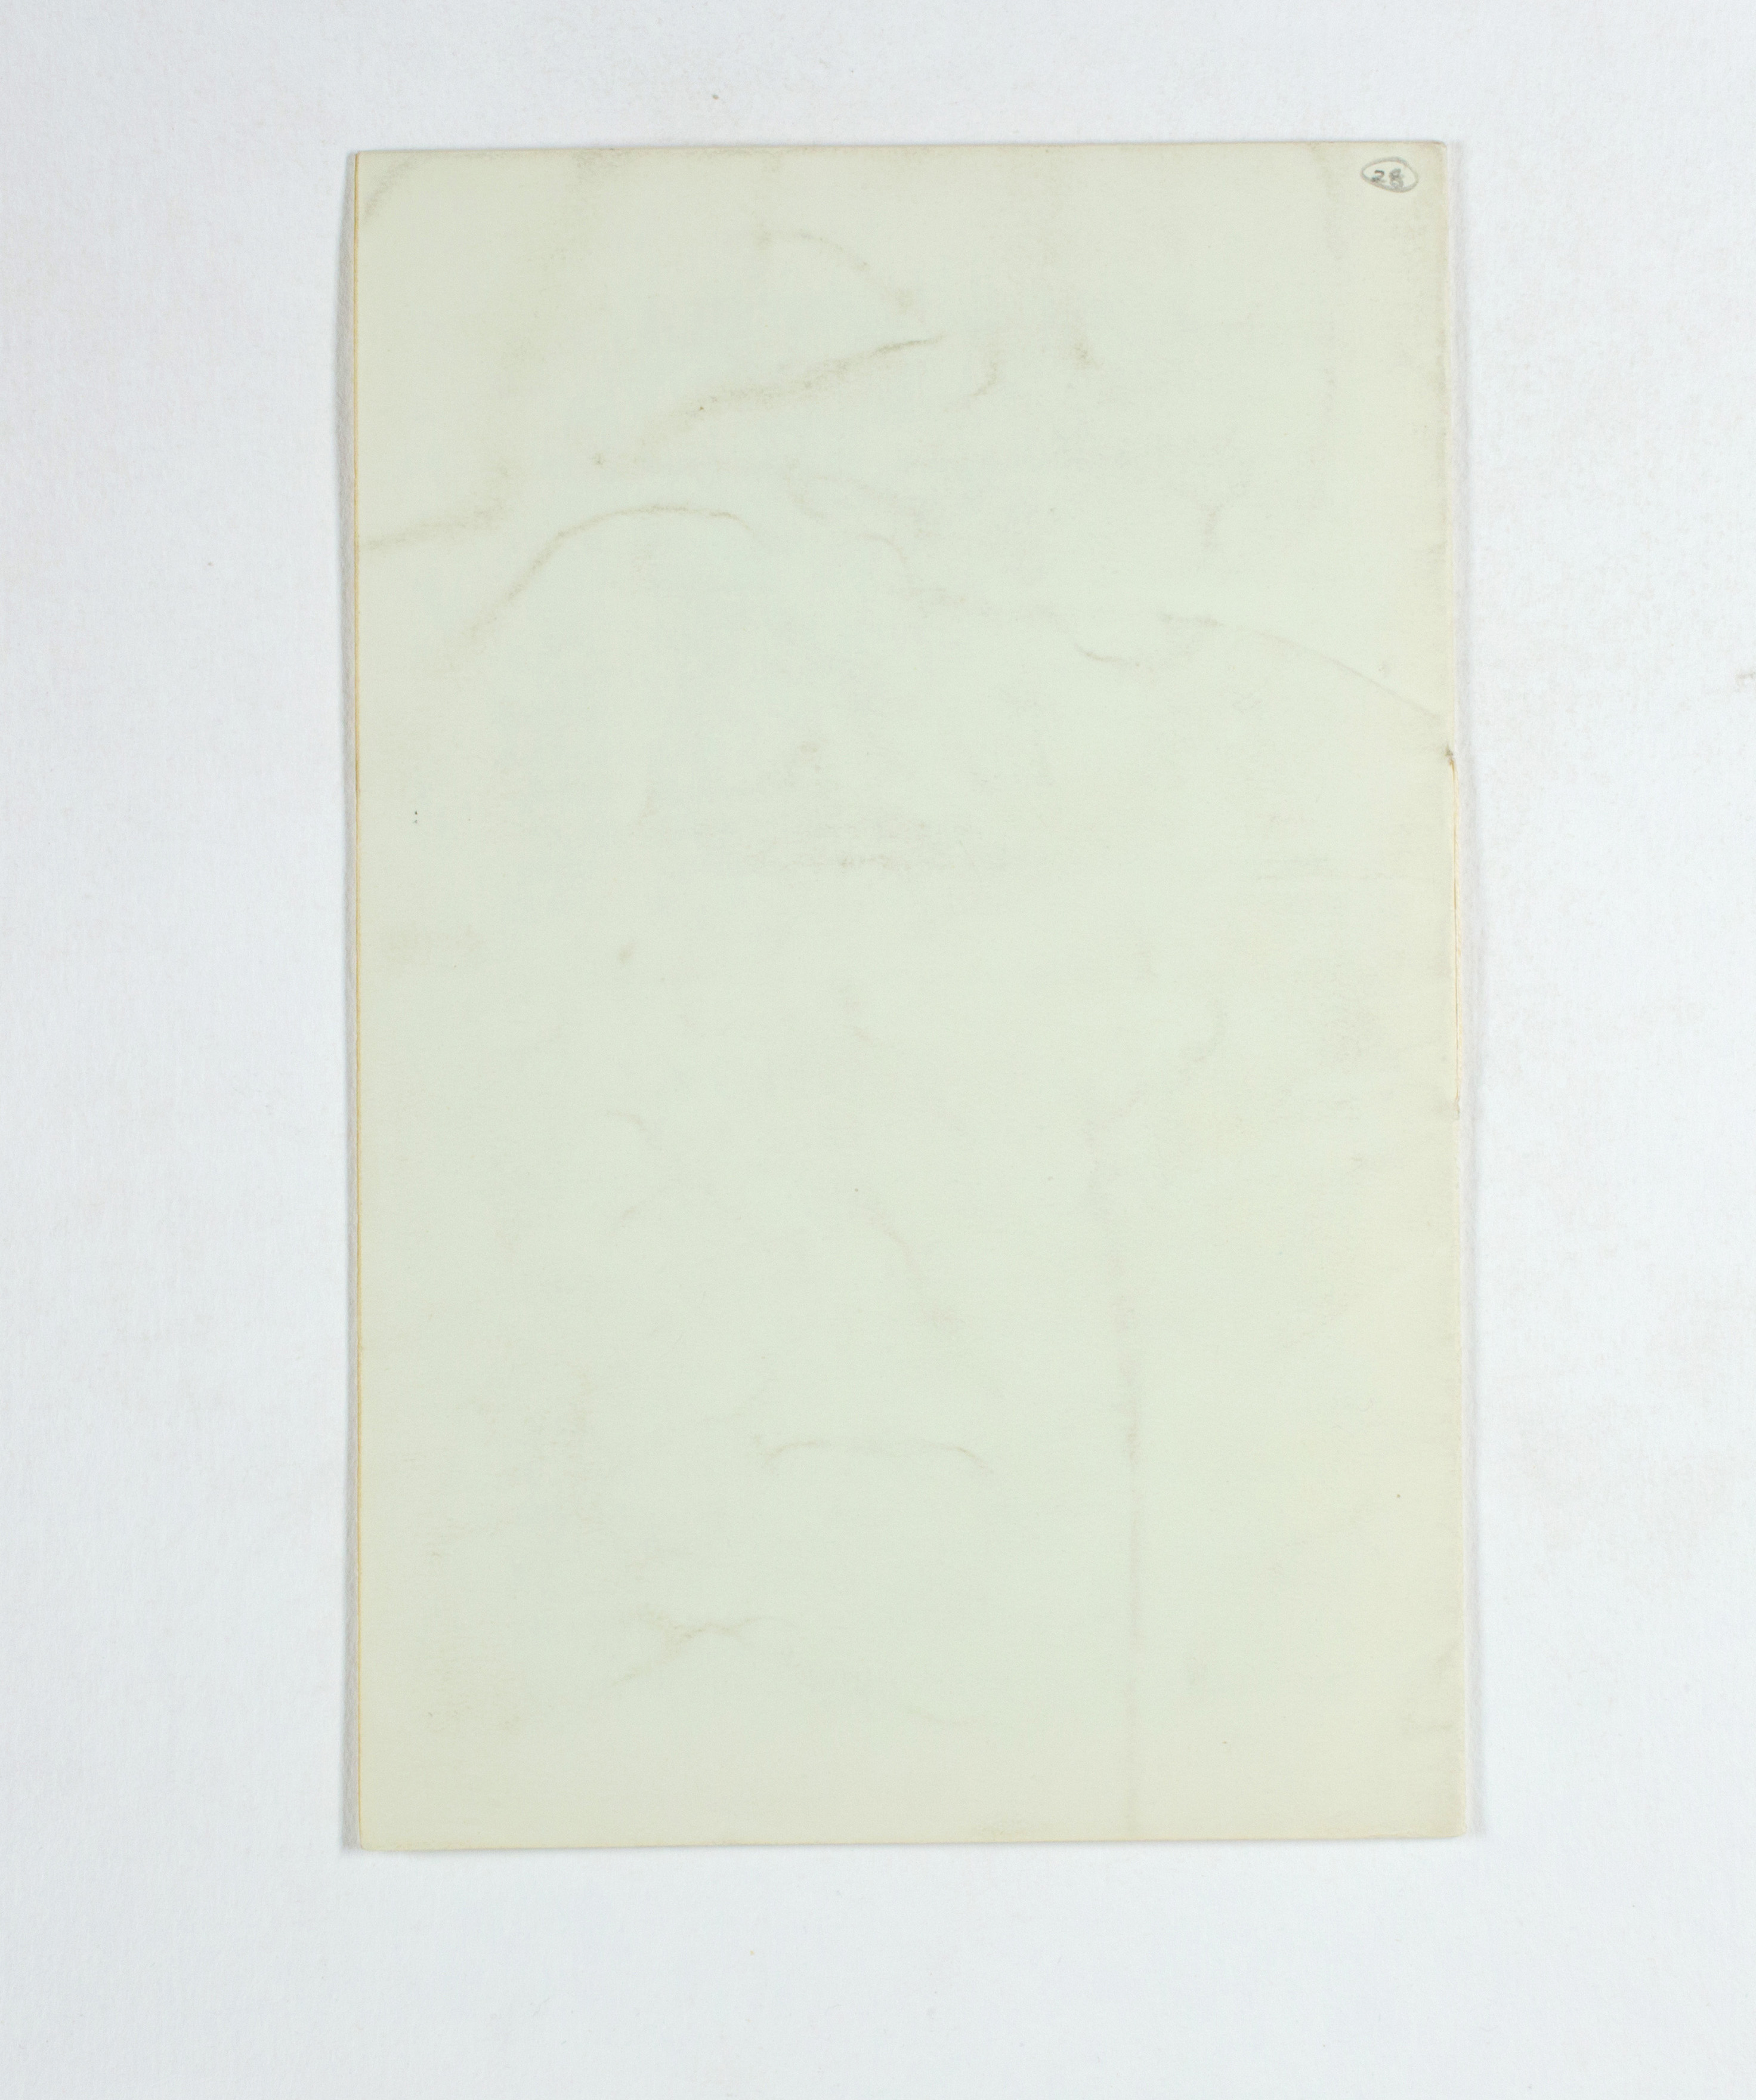 1924-25 Badari, Faiyum Exhibition catalogue PMA/WFP1/D/28/28.9